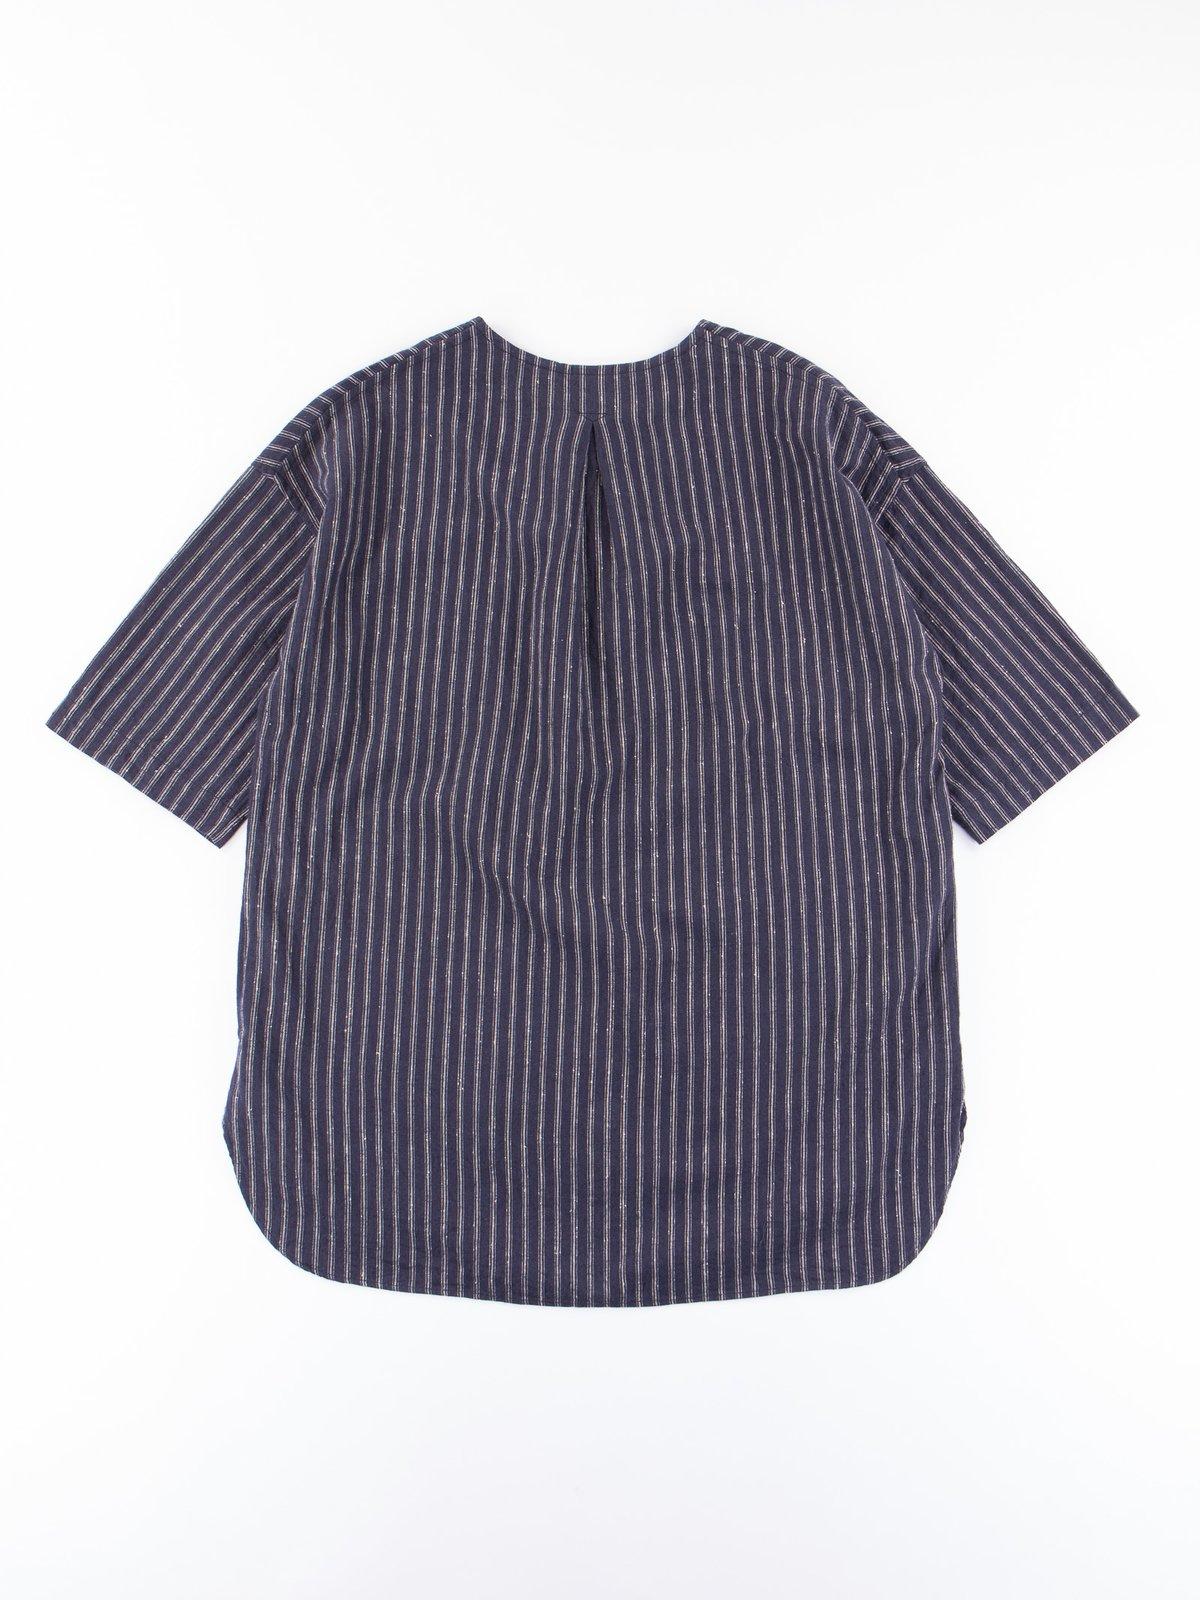 Dark Navy Stripe Henley SS Shirt - Image 4